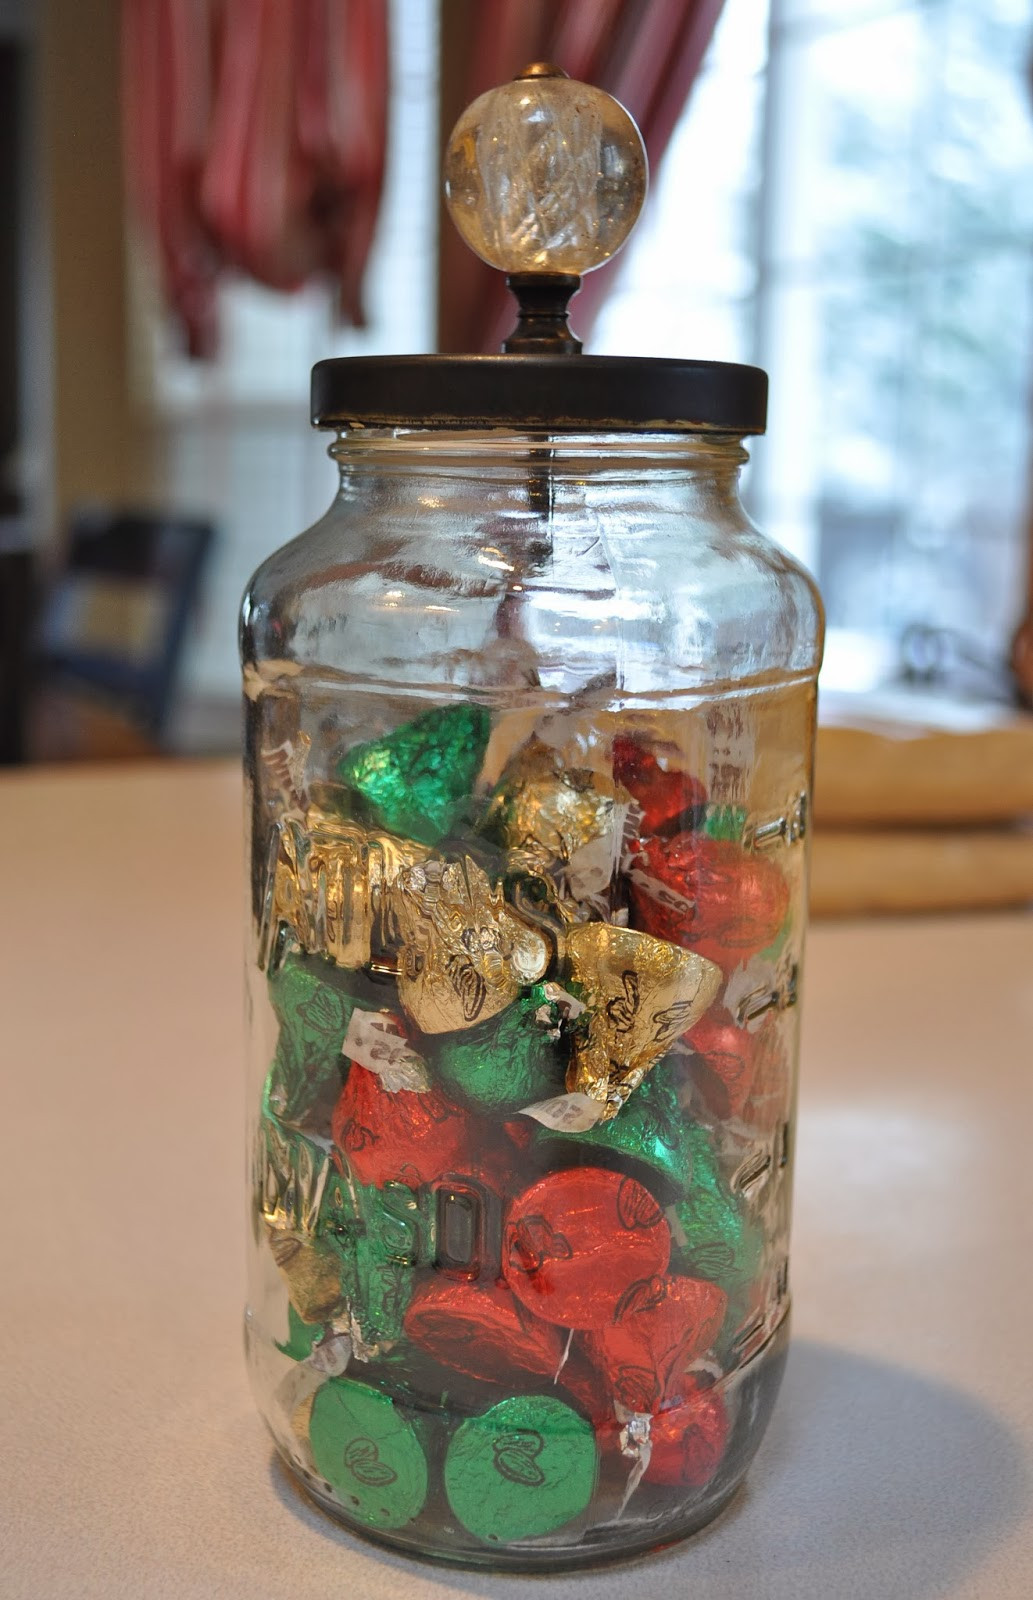 Christmas Candy Jars  Lisa s Scribbles Blog Archive DIY Christmas Candy Jars